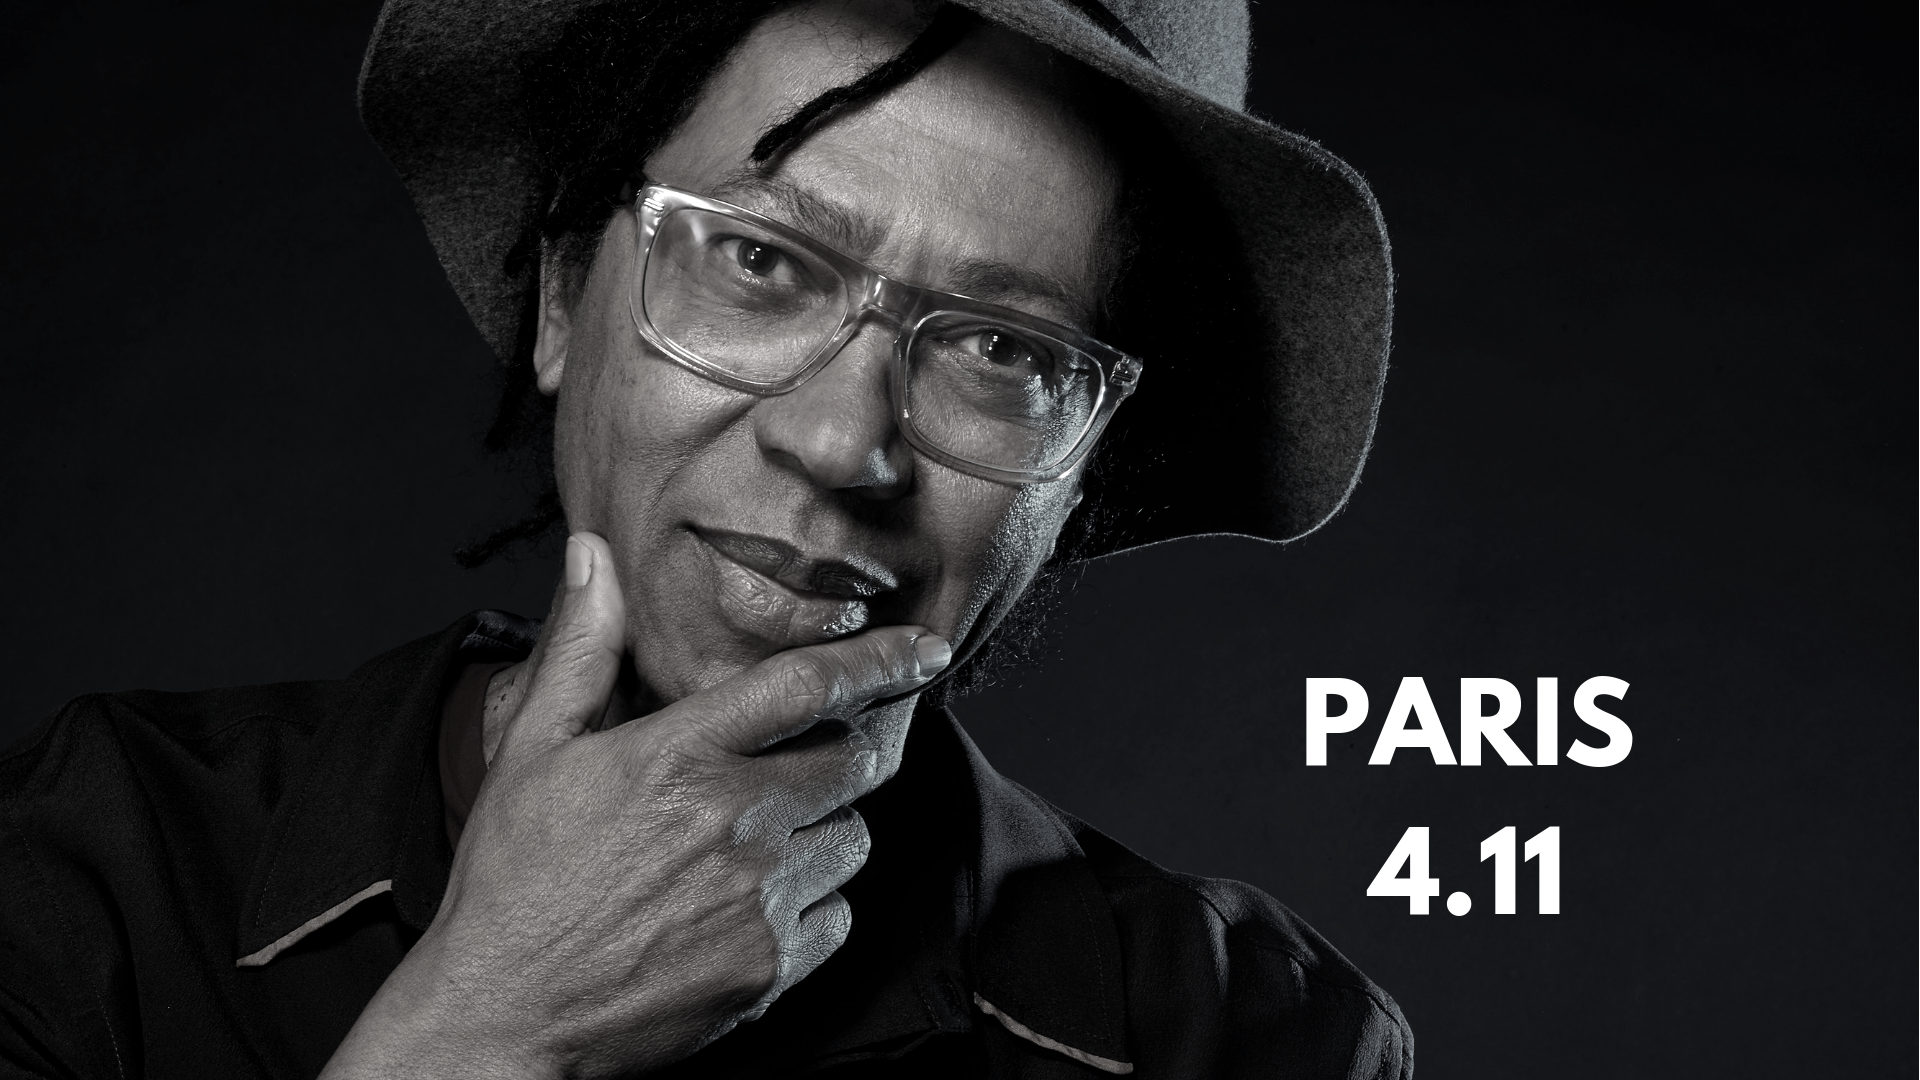 Buy Tickets - Djavan Paris 2019